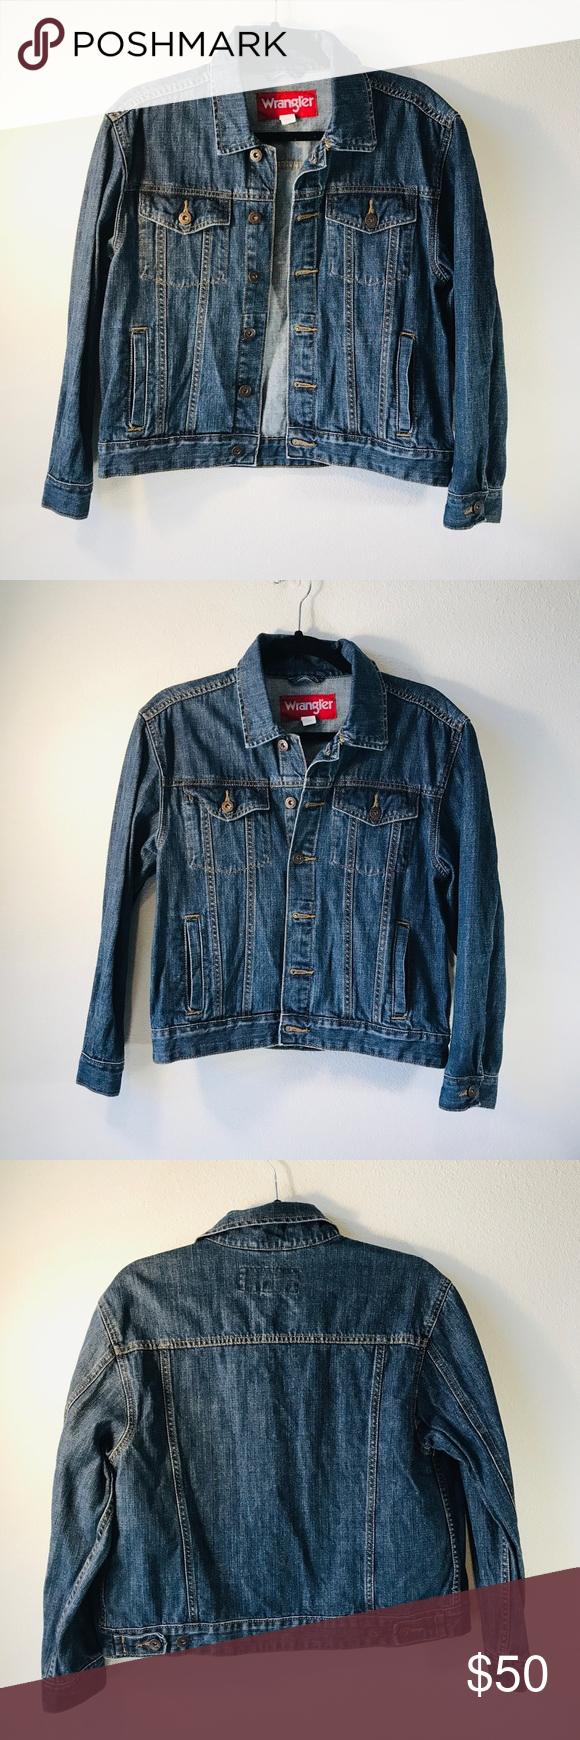 Wrangler Jean Jacket Denim Jacket Clothes Design Wrangler Jeans Jackets [ 1740 x 580 Pixel ]